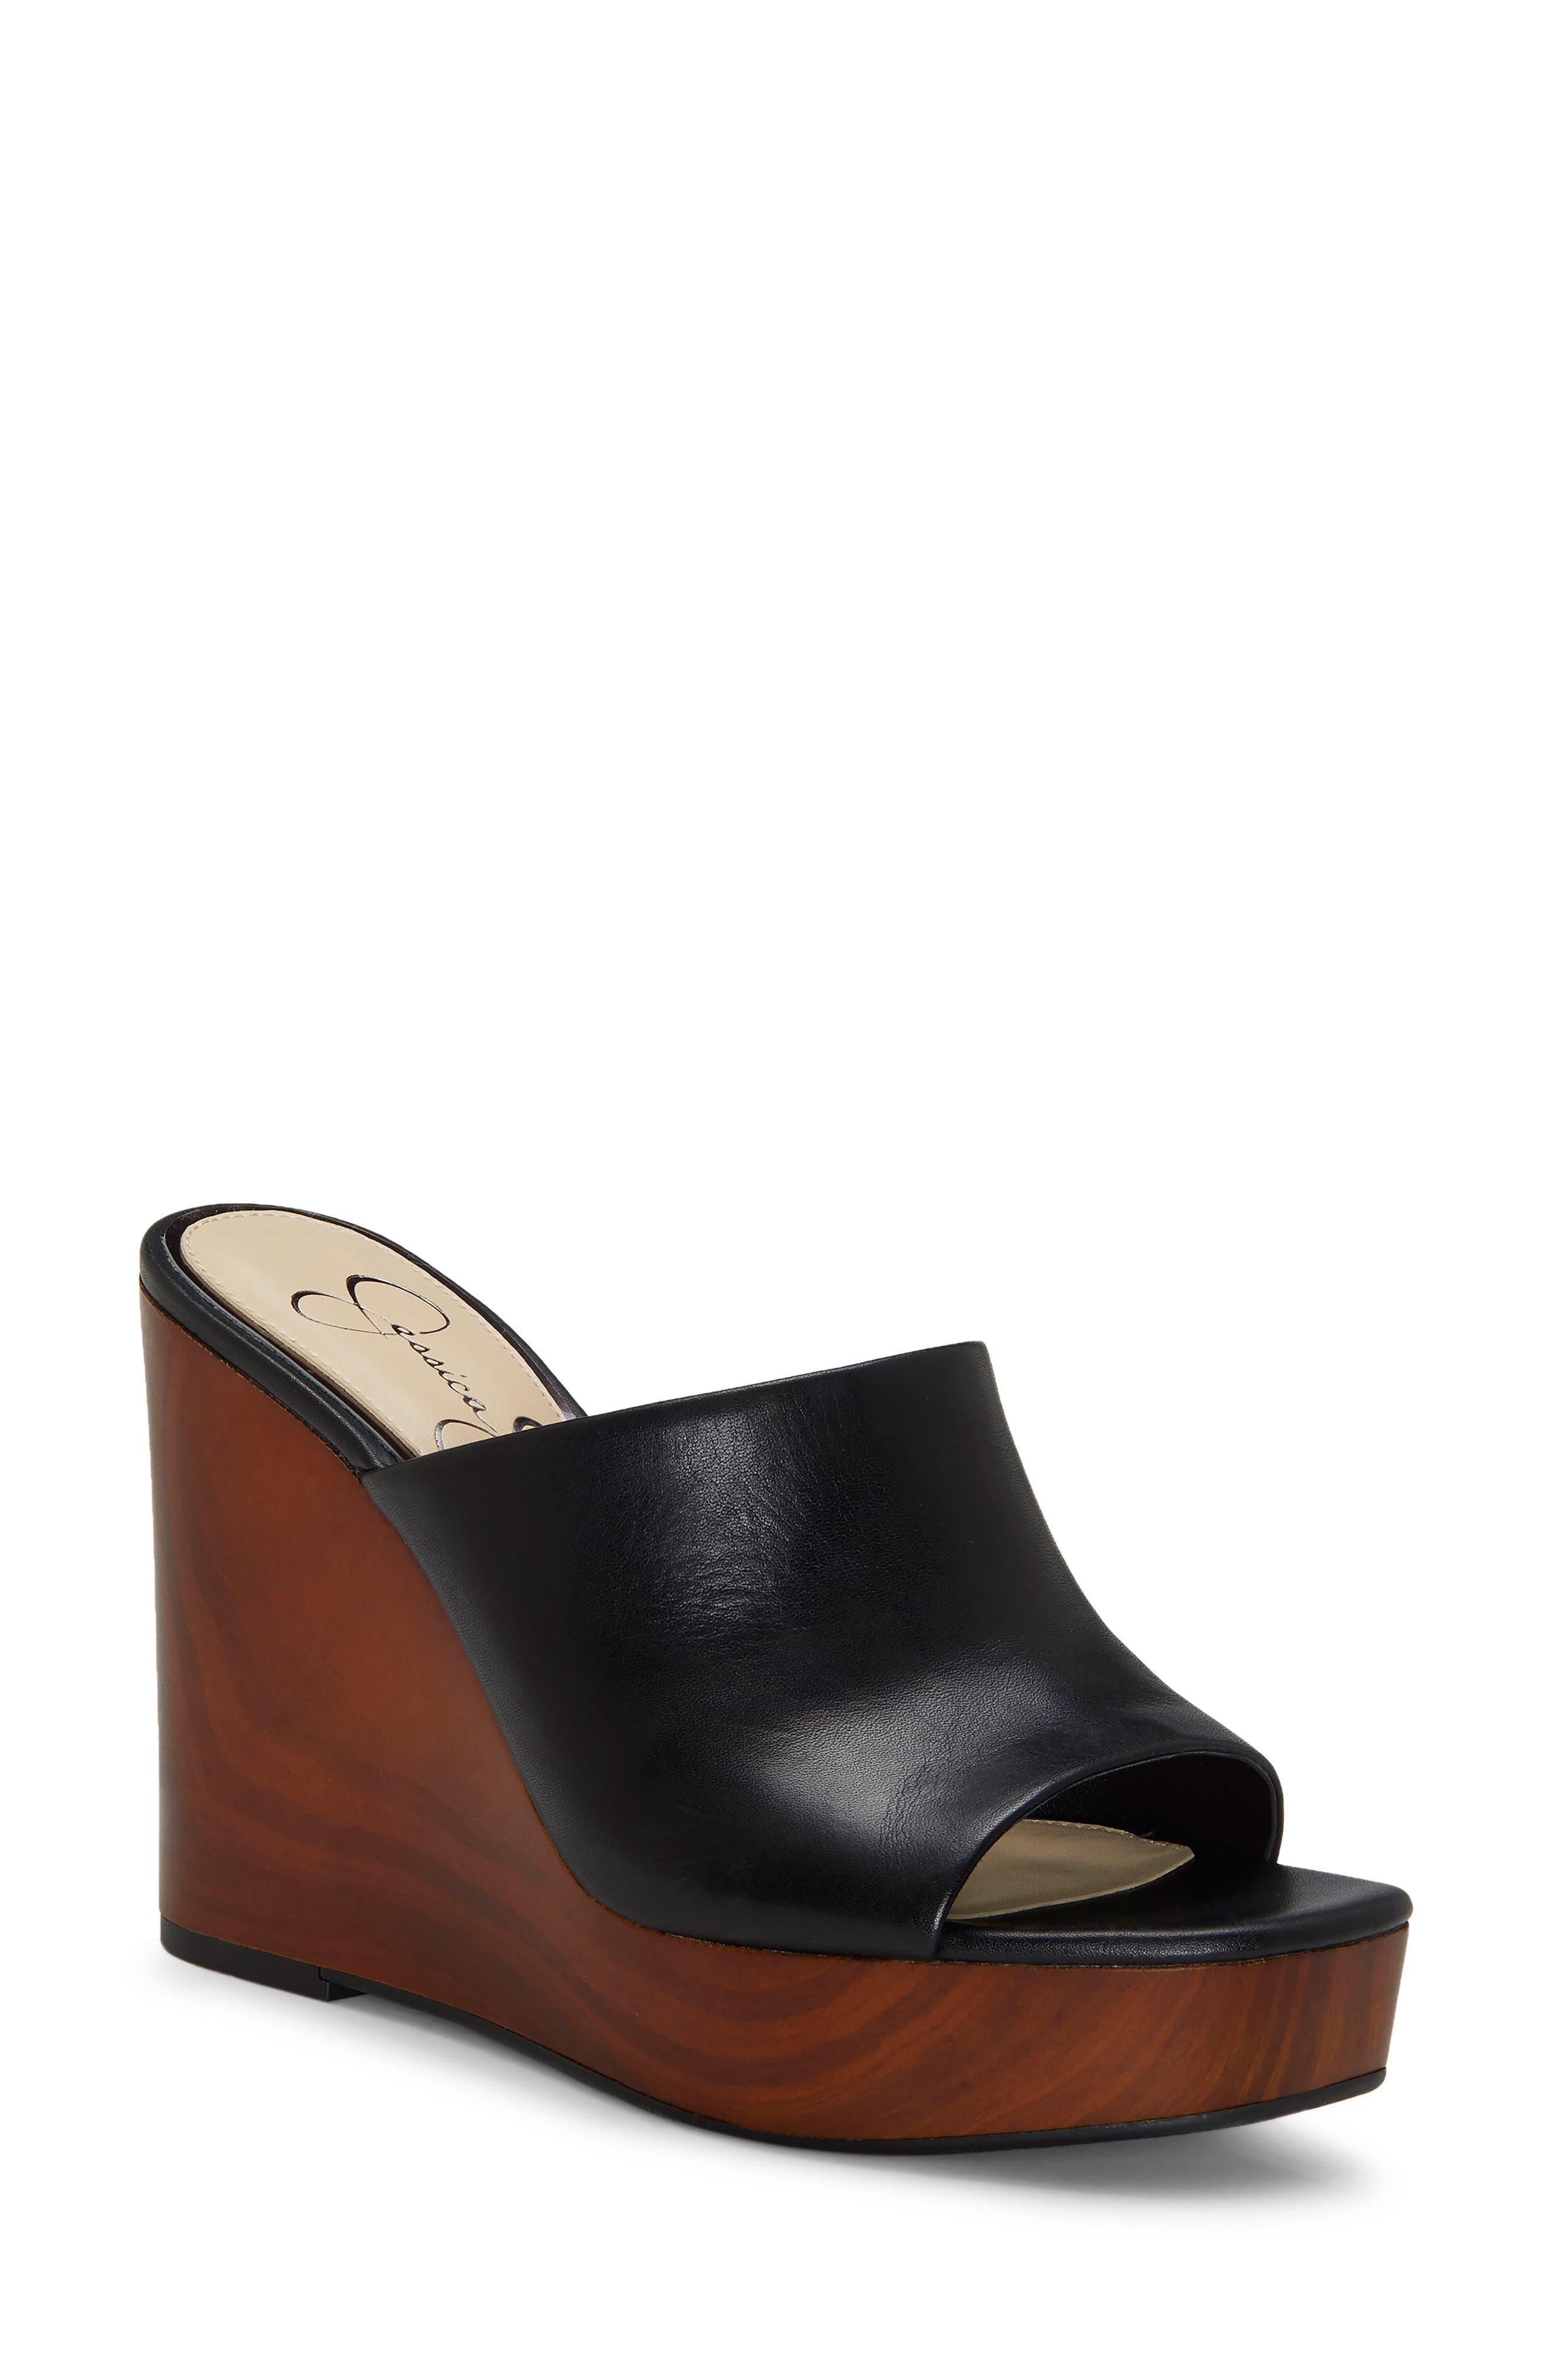 JESSICA SIMPSON Shantelle Wedge Slide Sandal, Main, color, BLACK LEATHER